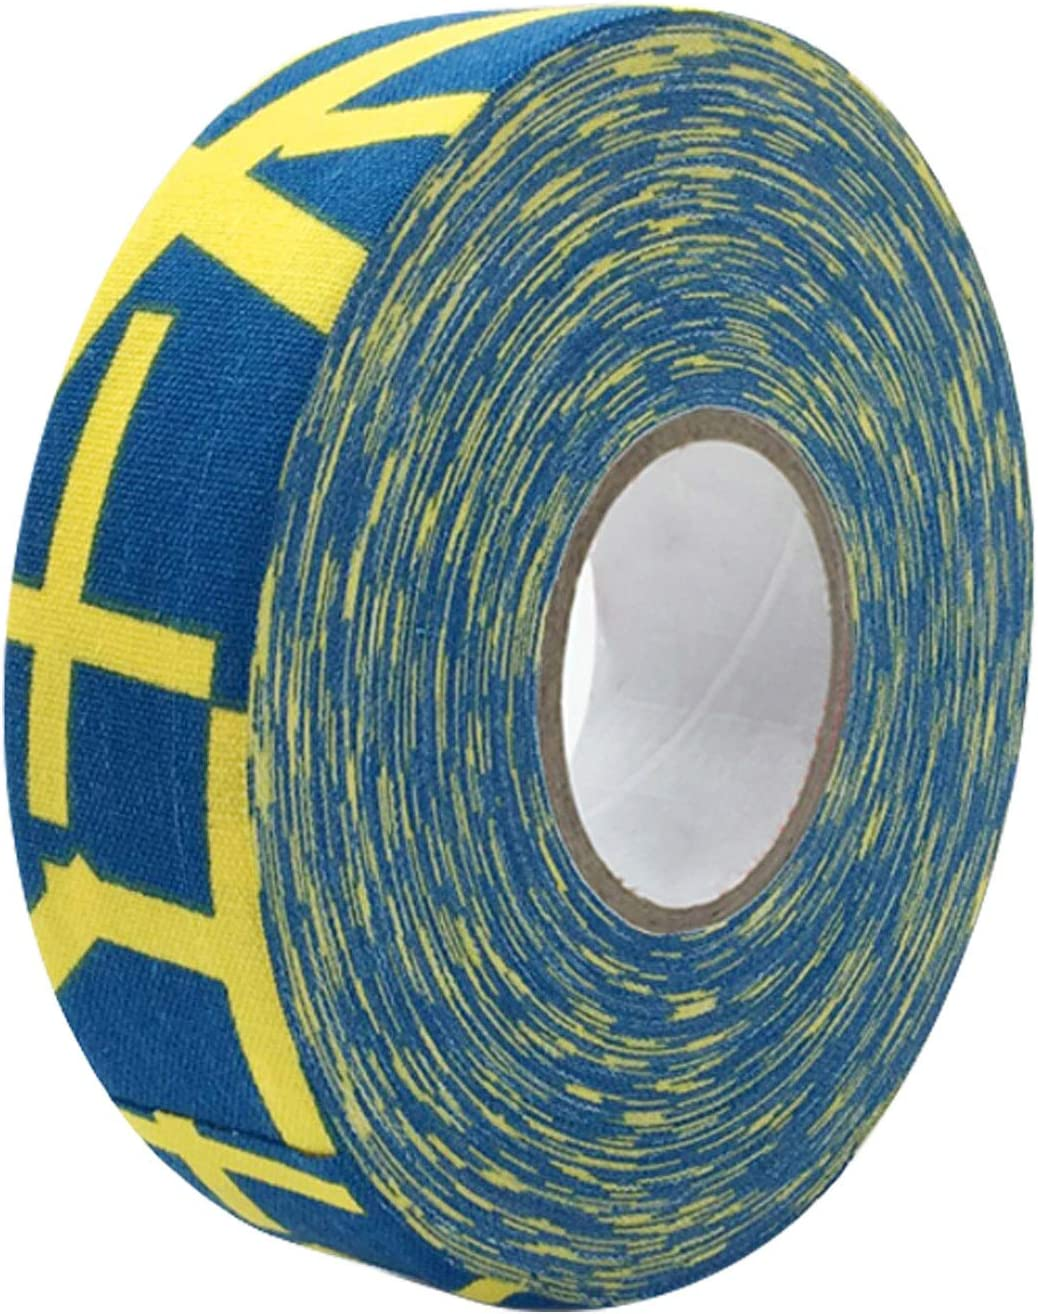 Bande adh/ésive de Sport de Bande de b/âton de Tissu de Hockey Durable Anti-d/érapant pour poign/ées de Tennis de Badminton de Crosse de Hockey Beetest Hockey Tape